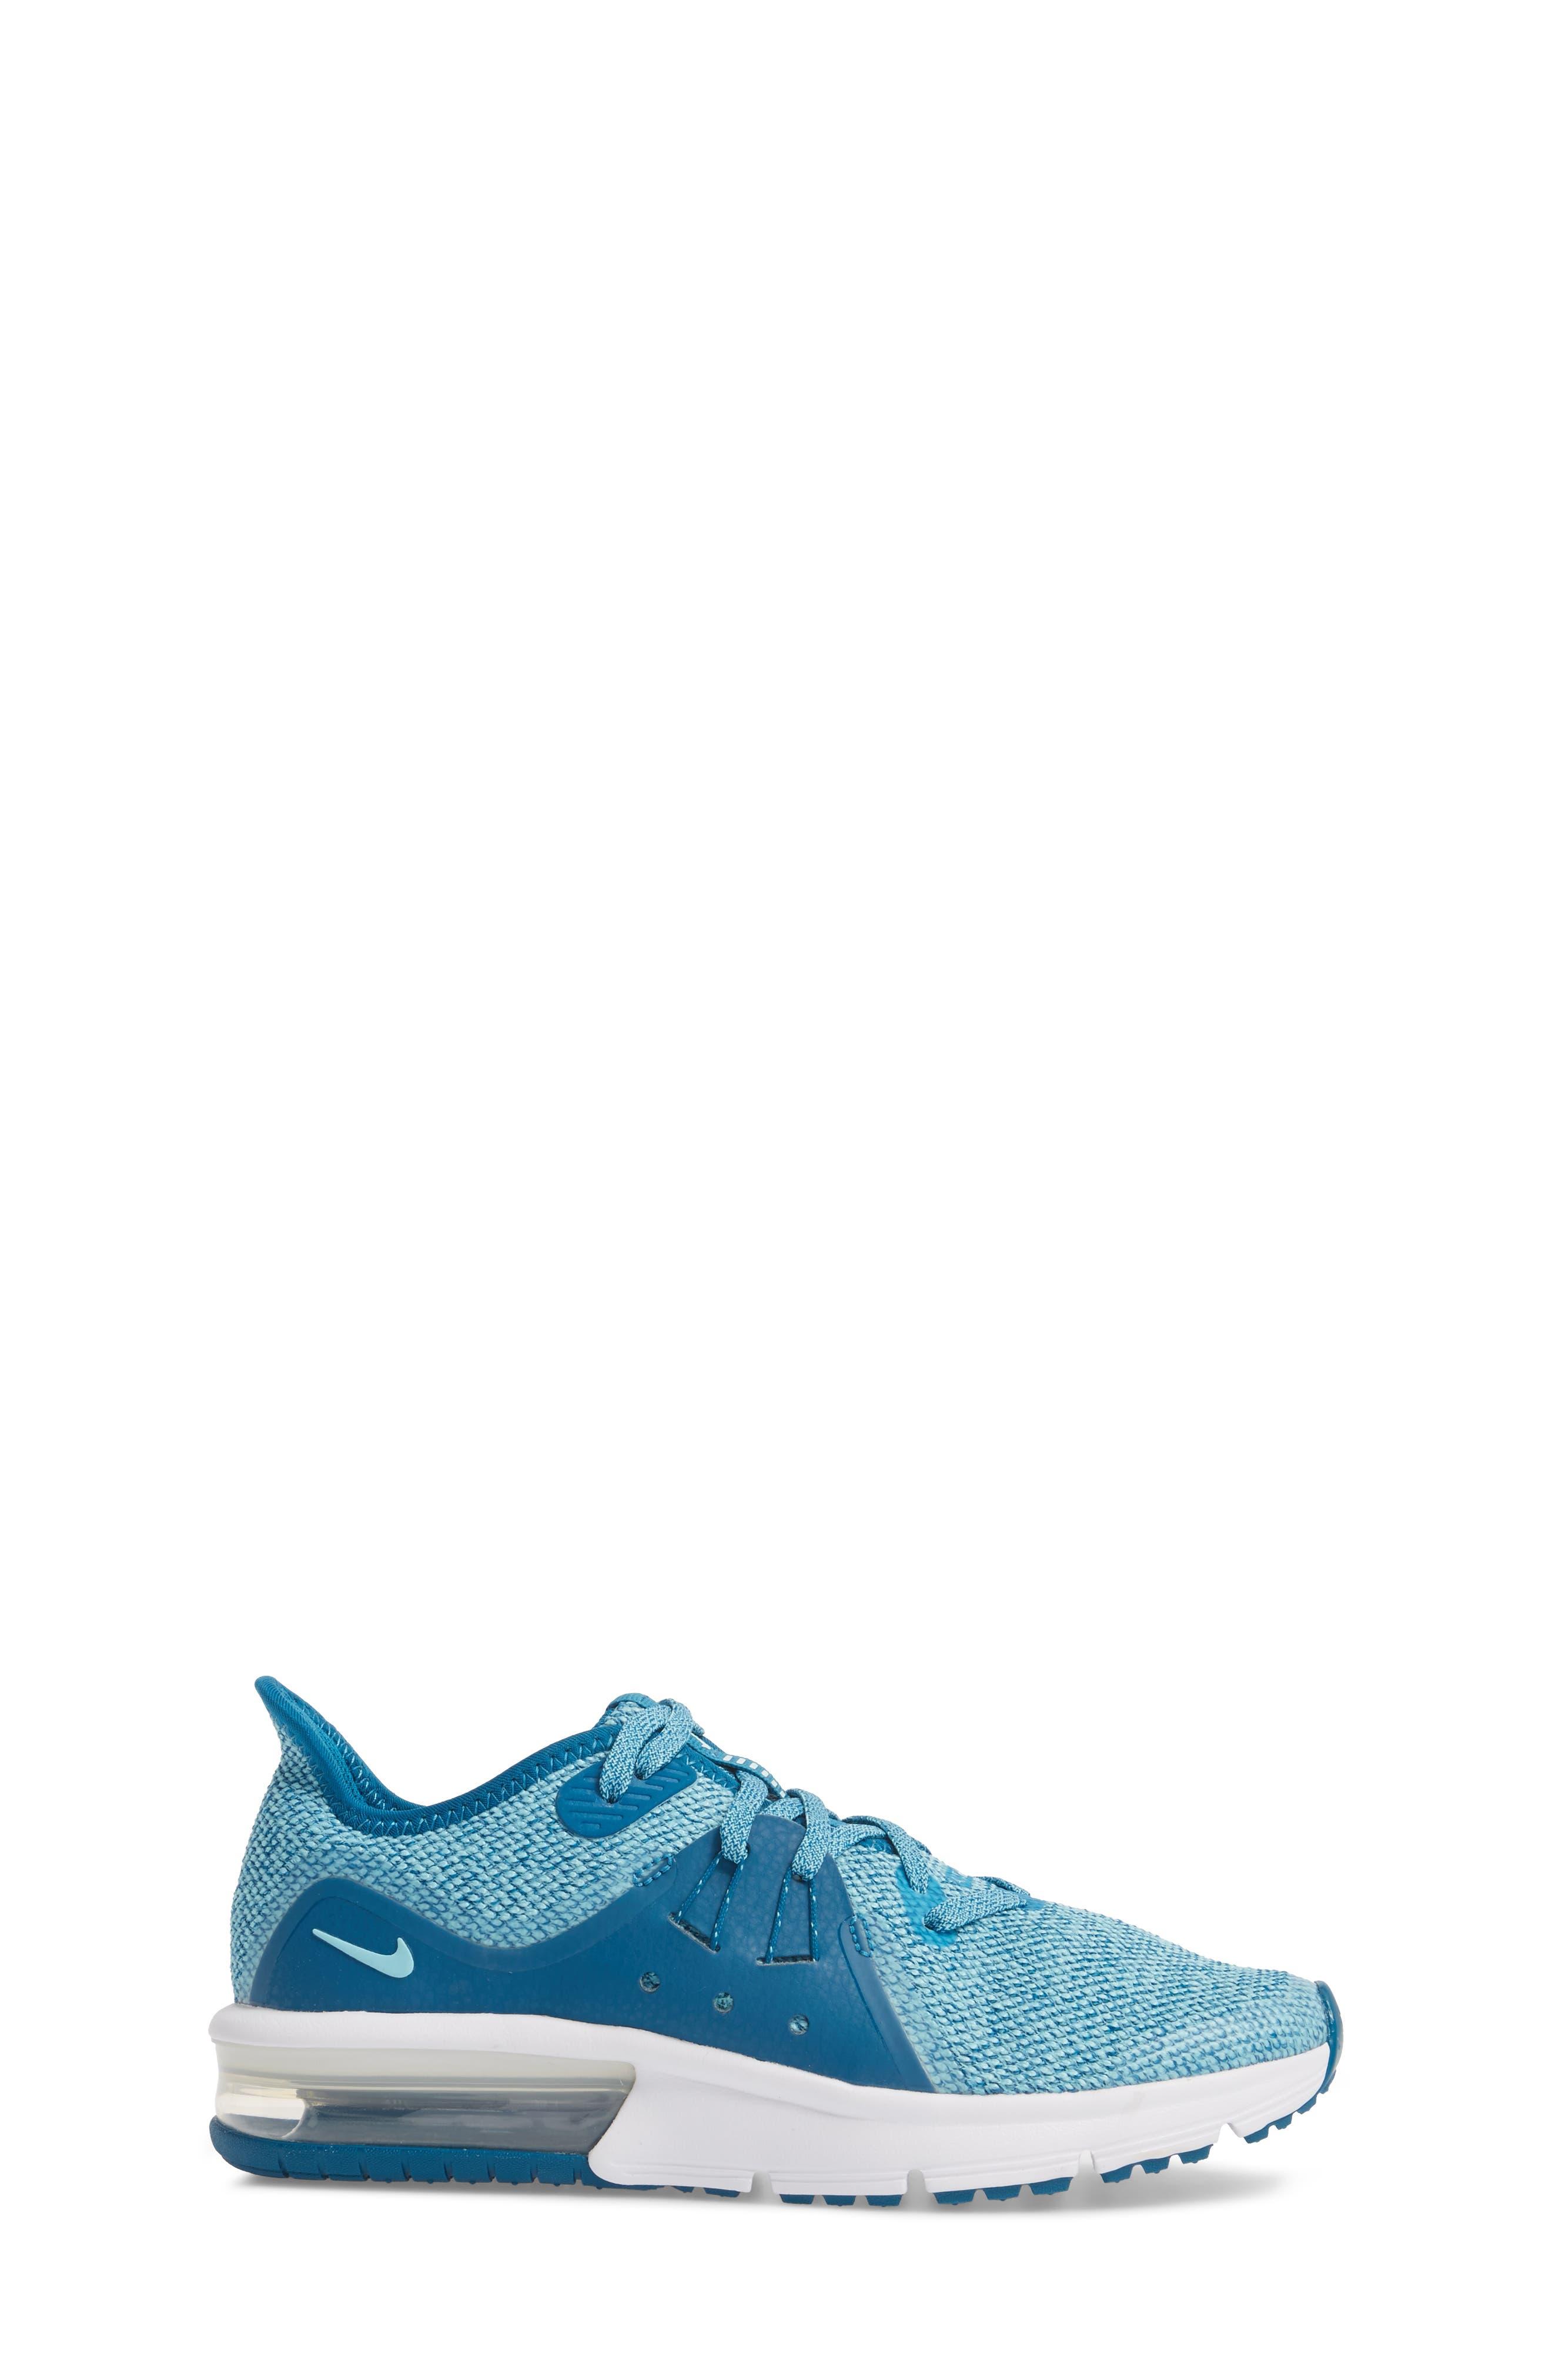 Air Max Sequent 3 GS Running Shoe,                             Alternate thumbnail 4, color,                             Green/ Igloo/ Bleached Aqua